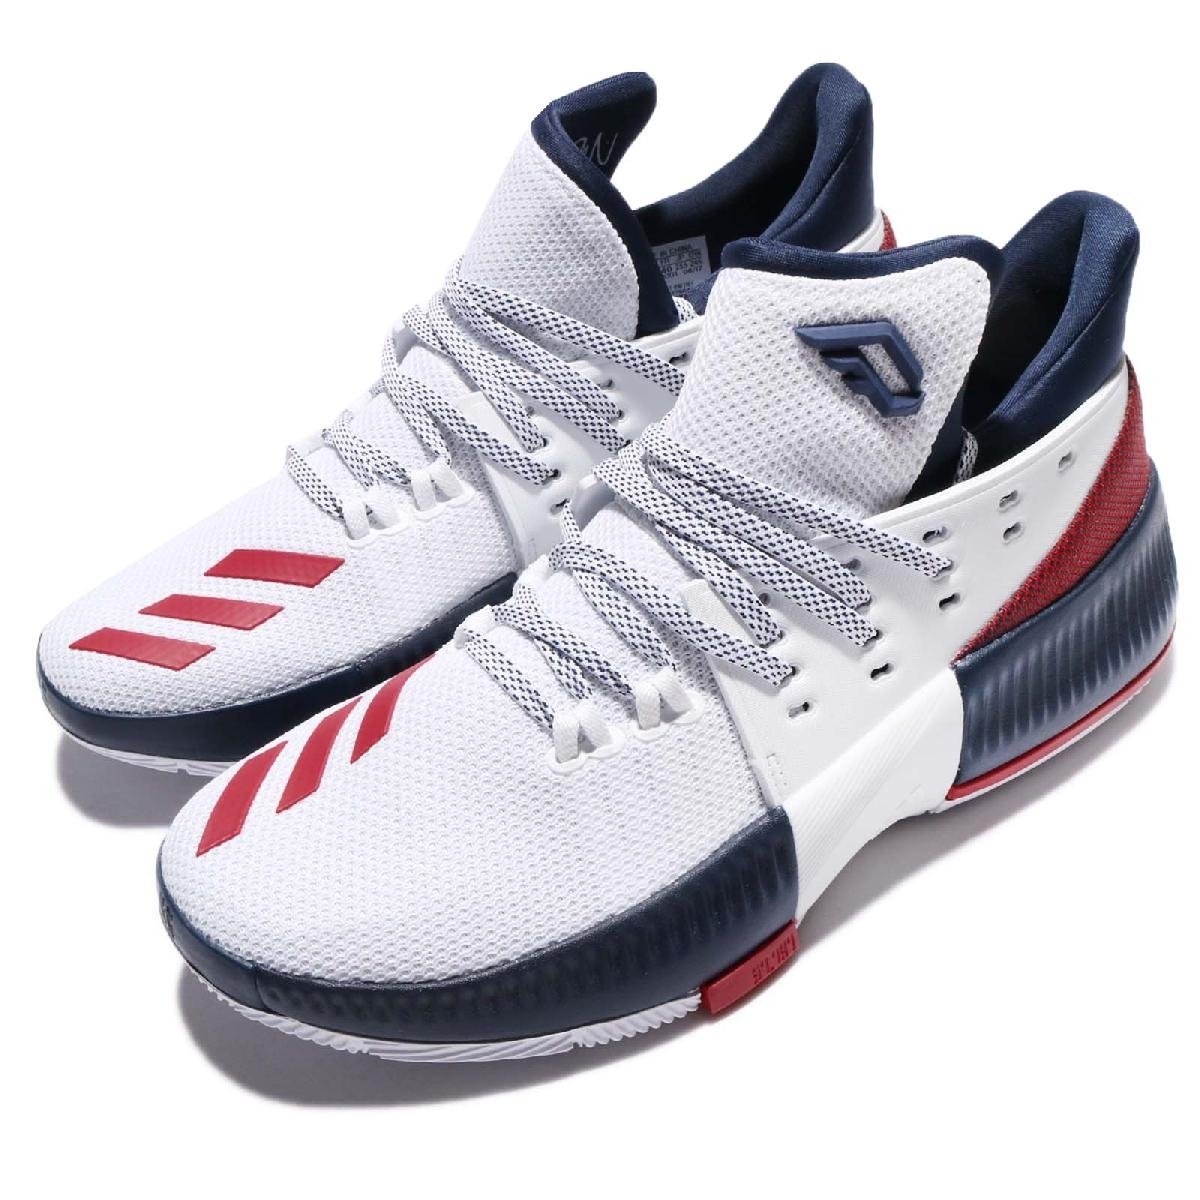 adidas籃球鞋Dame 3 J白藍紅USA配色Damian Lillard女鞋大童鞋PUMP306 BW1101